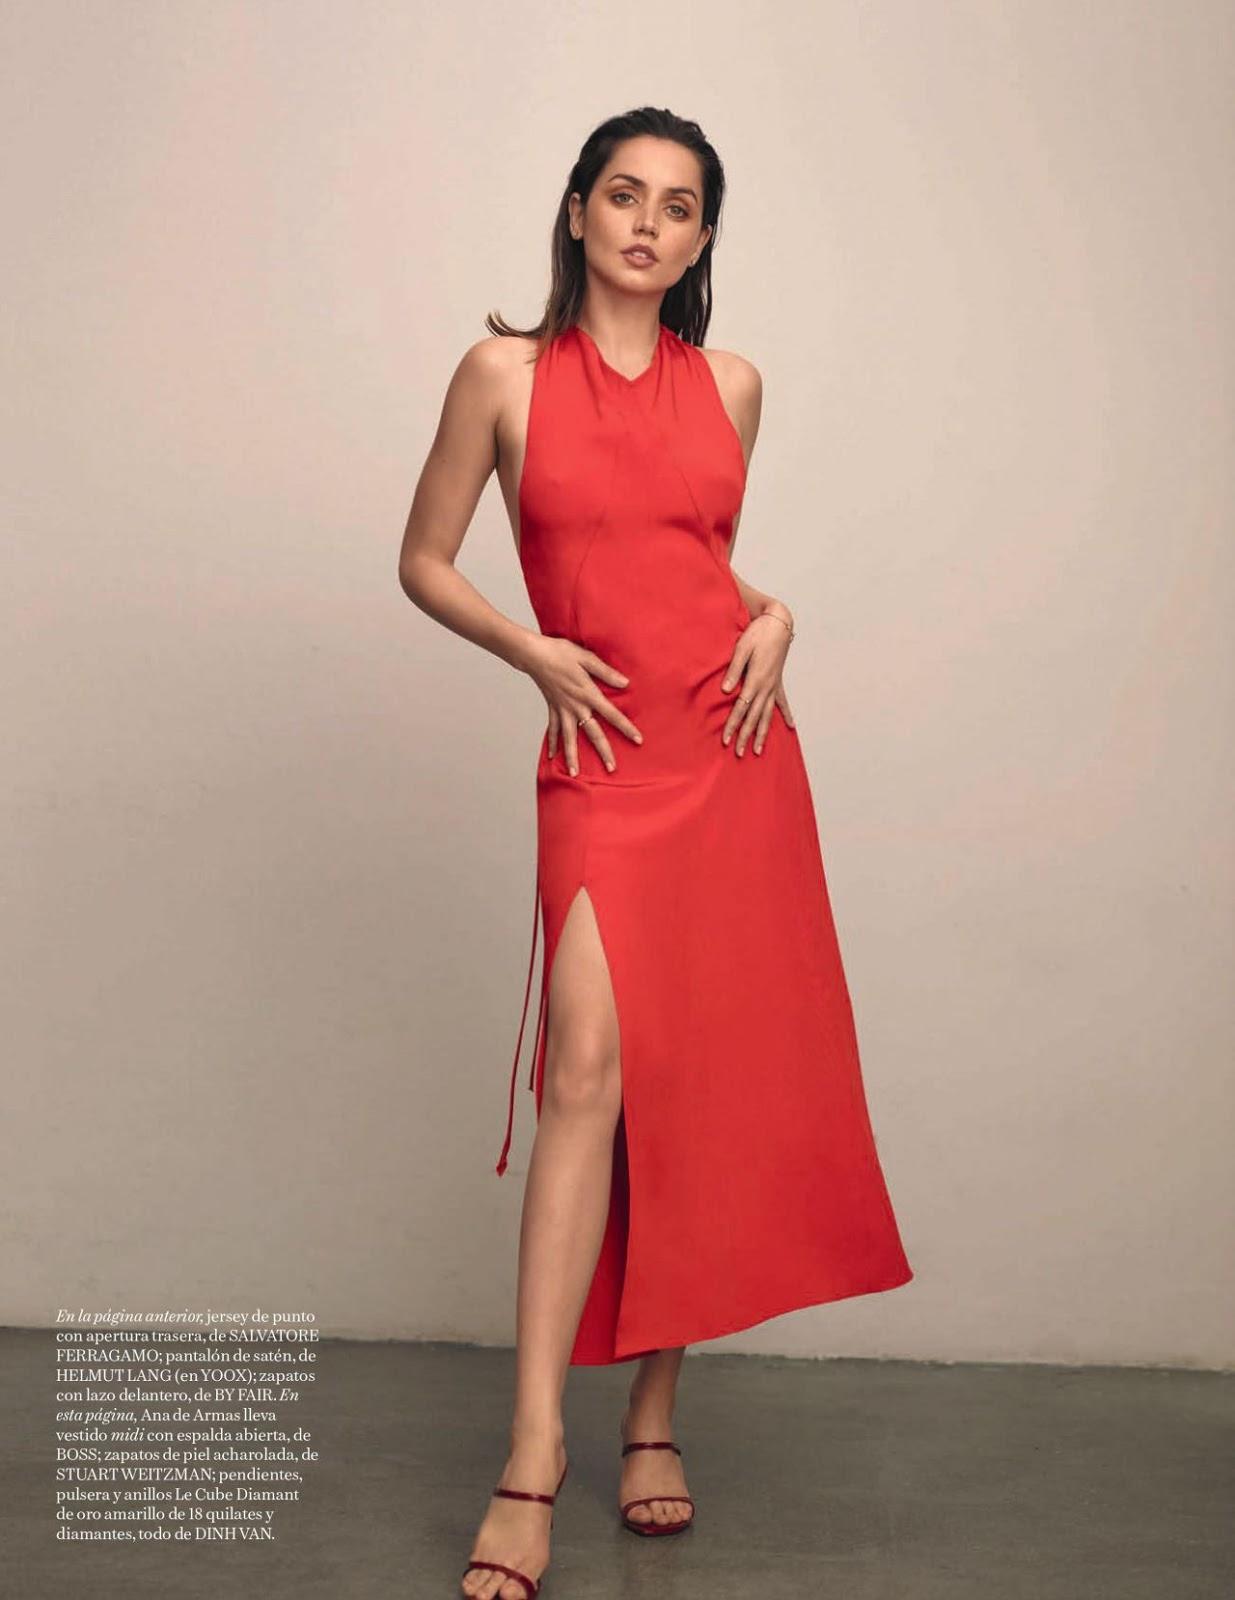 Ana De Armas - Vogue Spain April 2020 Issue